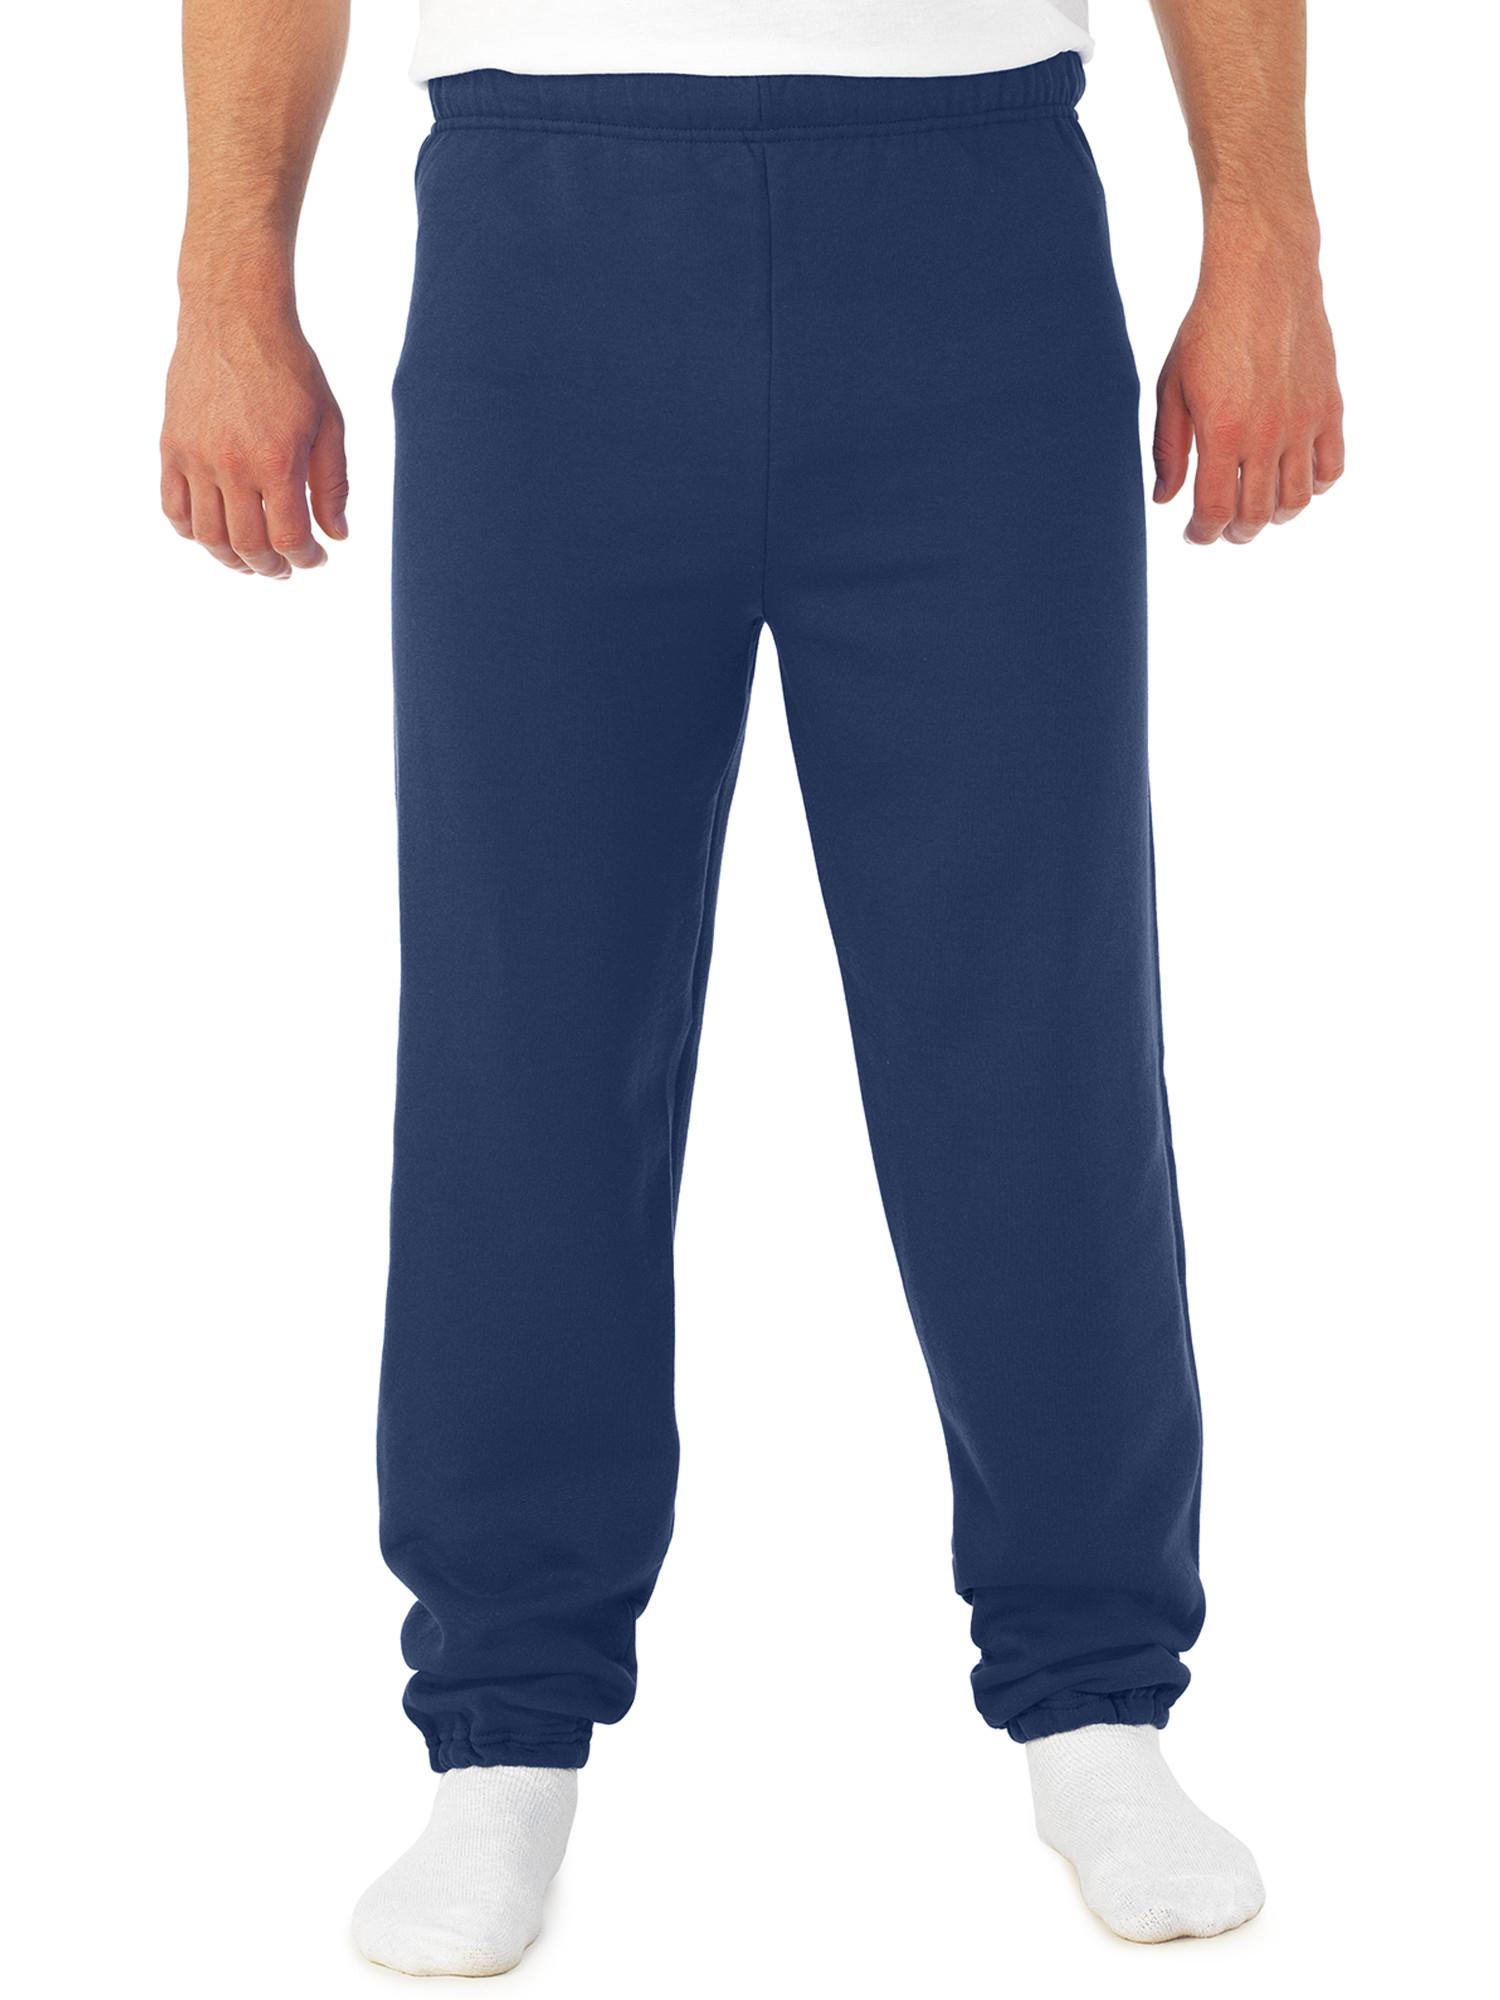 Big Men's Soft Medium-Weight Fleece Elastic Bottom Sweatpants